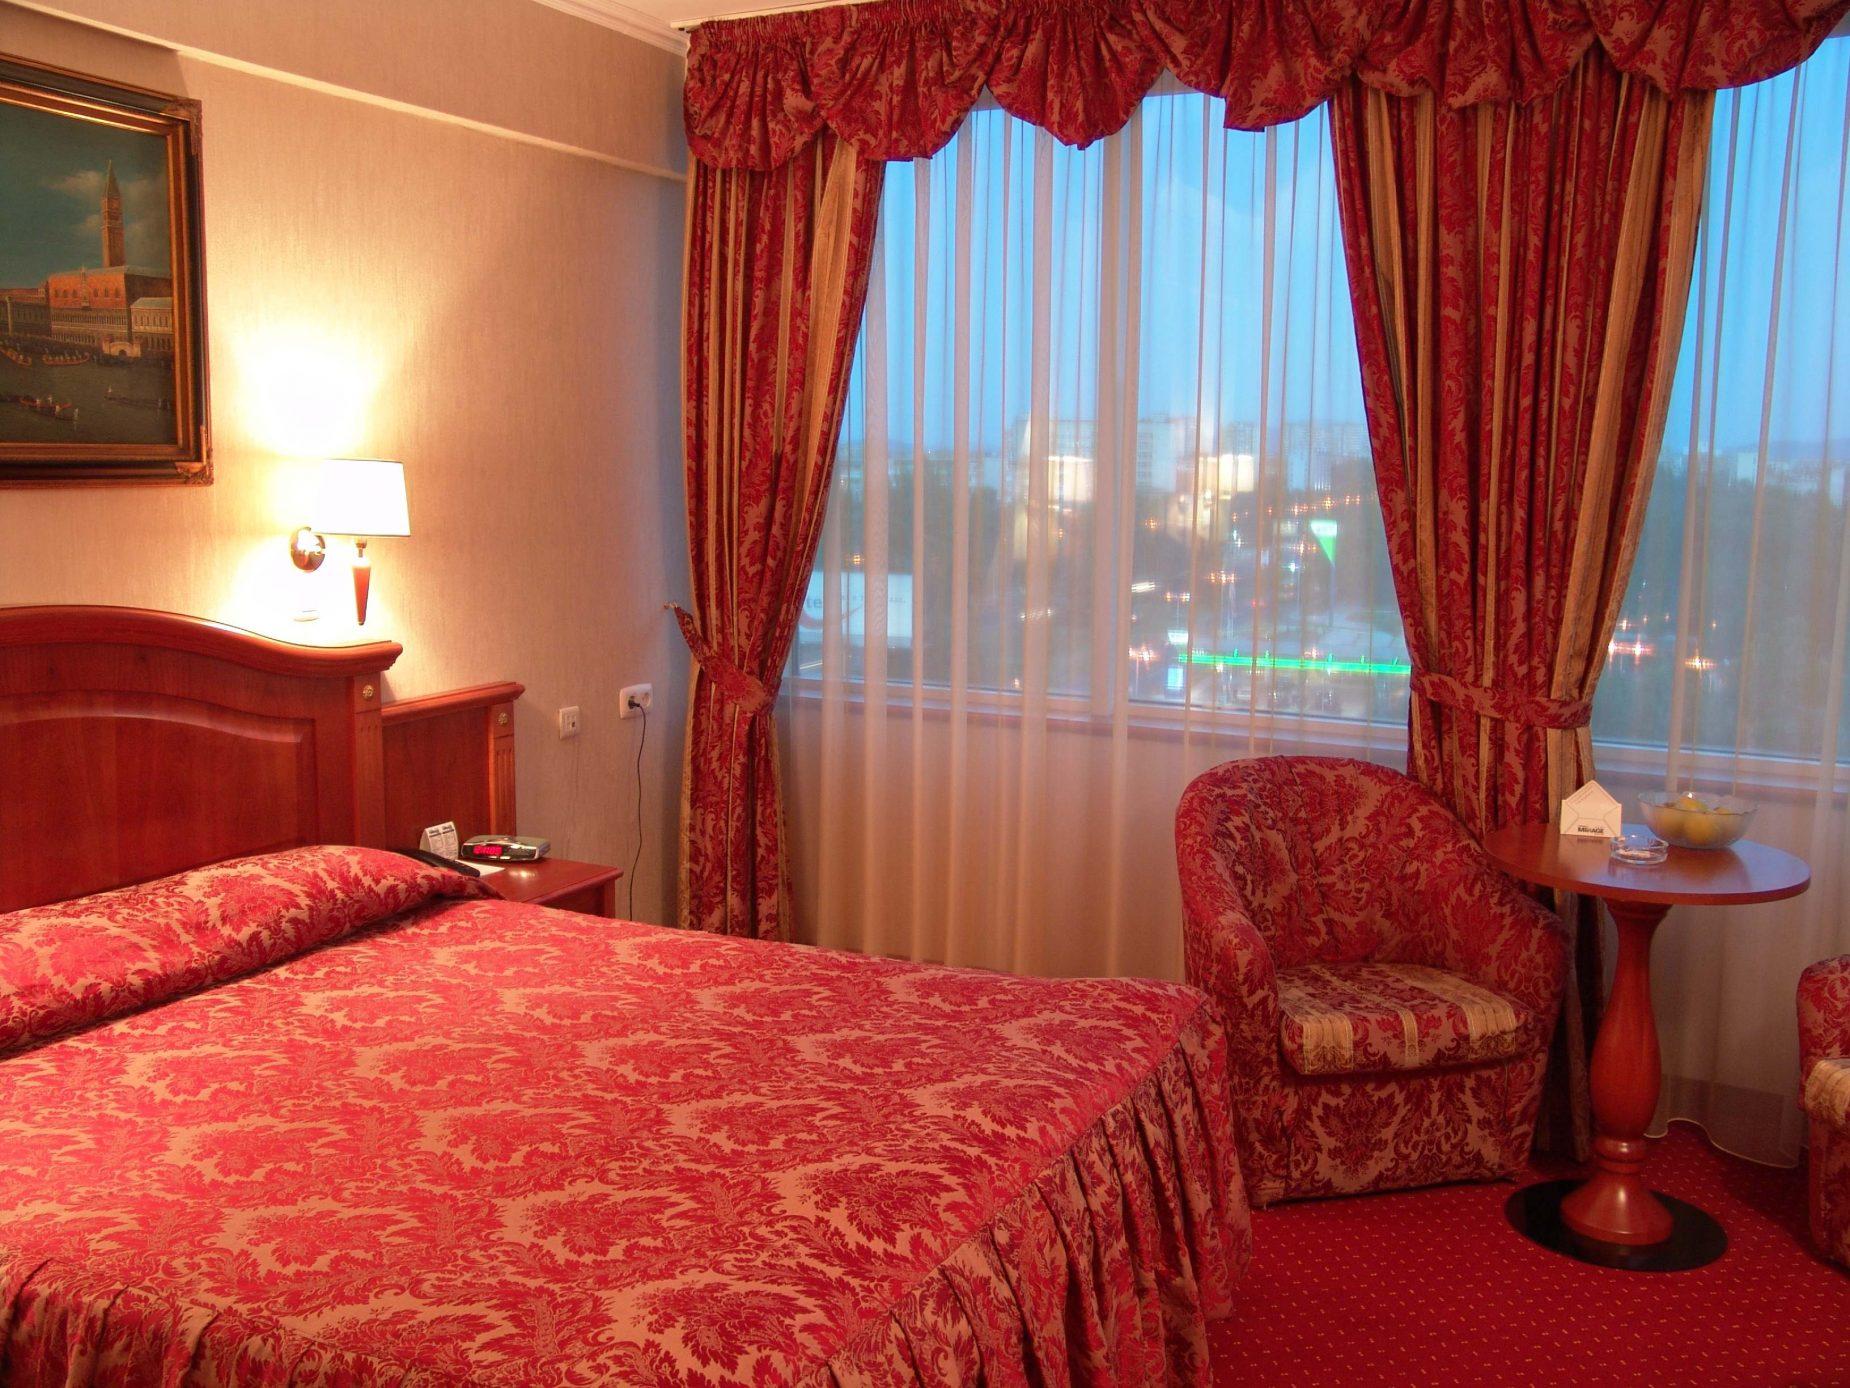 VIP Room Mirage Hotel